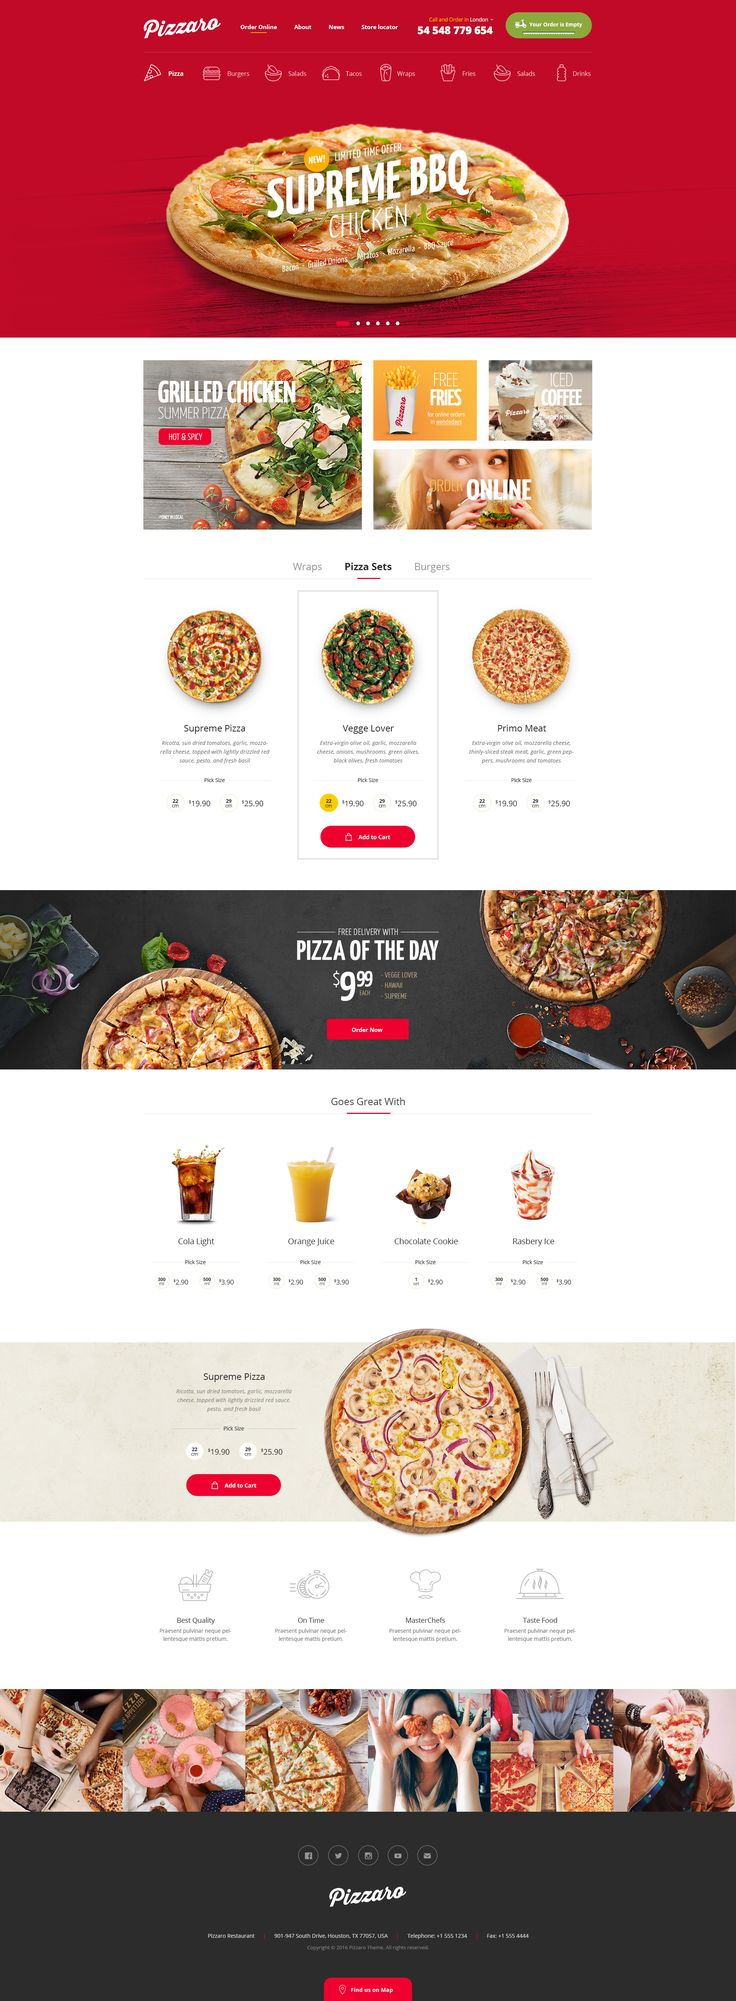 https://themeforest.net/item/pizzaro-food-online-ordering-ecommerce-psd/17024608?ref=pxcr